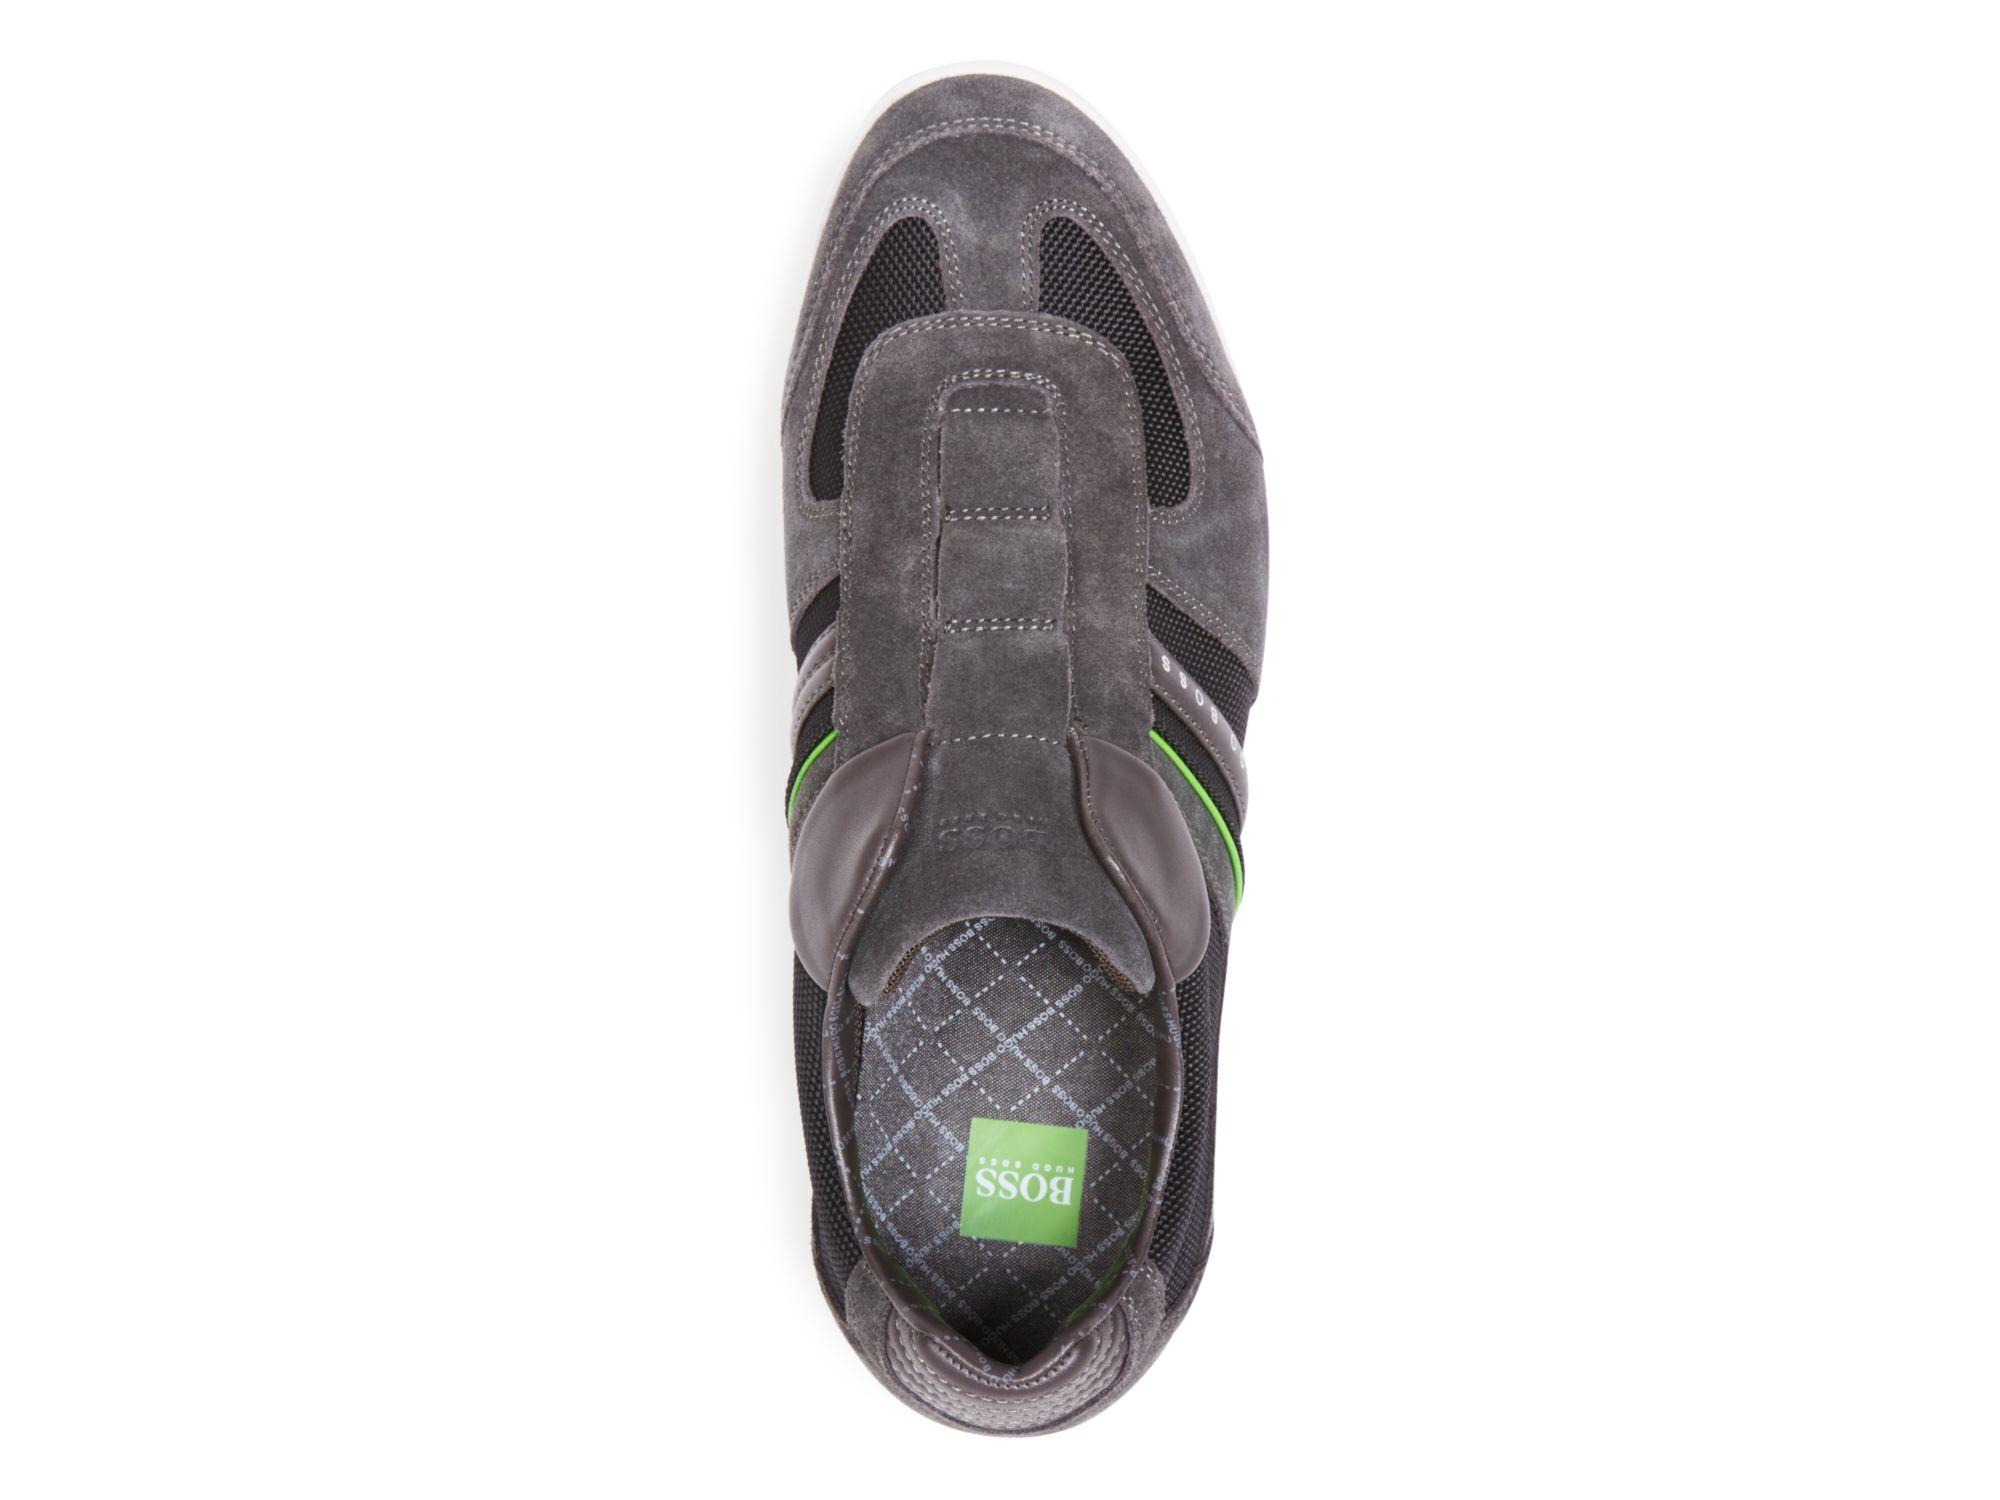 Boss Green Akeen Laceless Sneakers